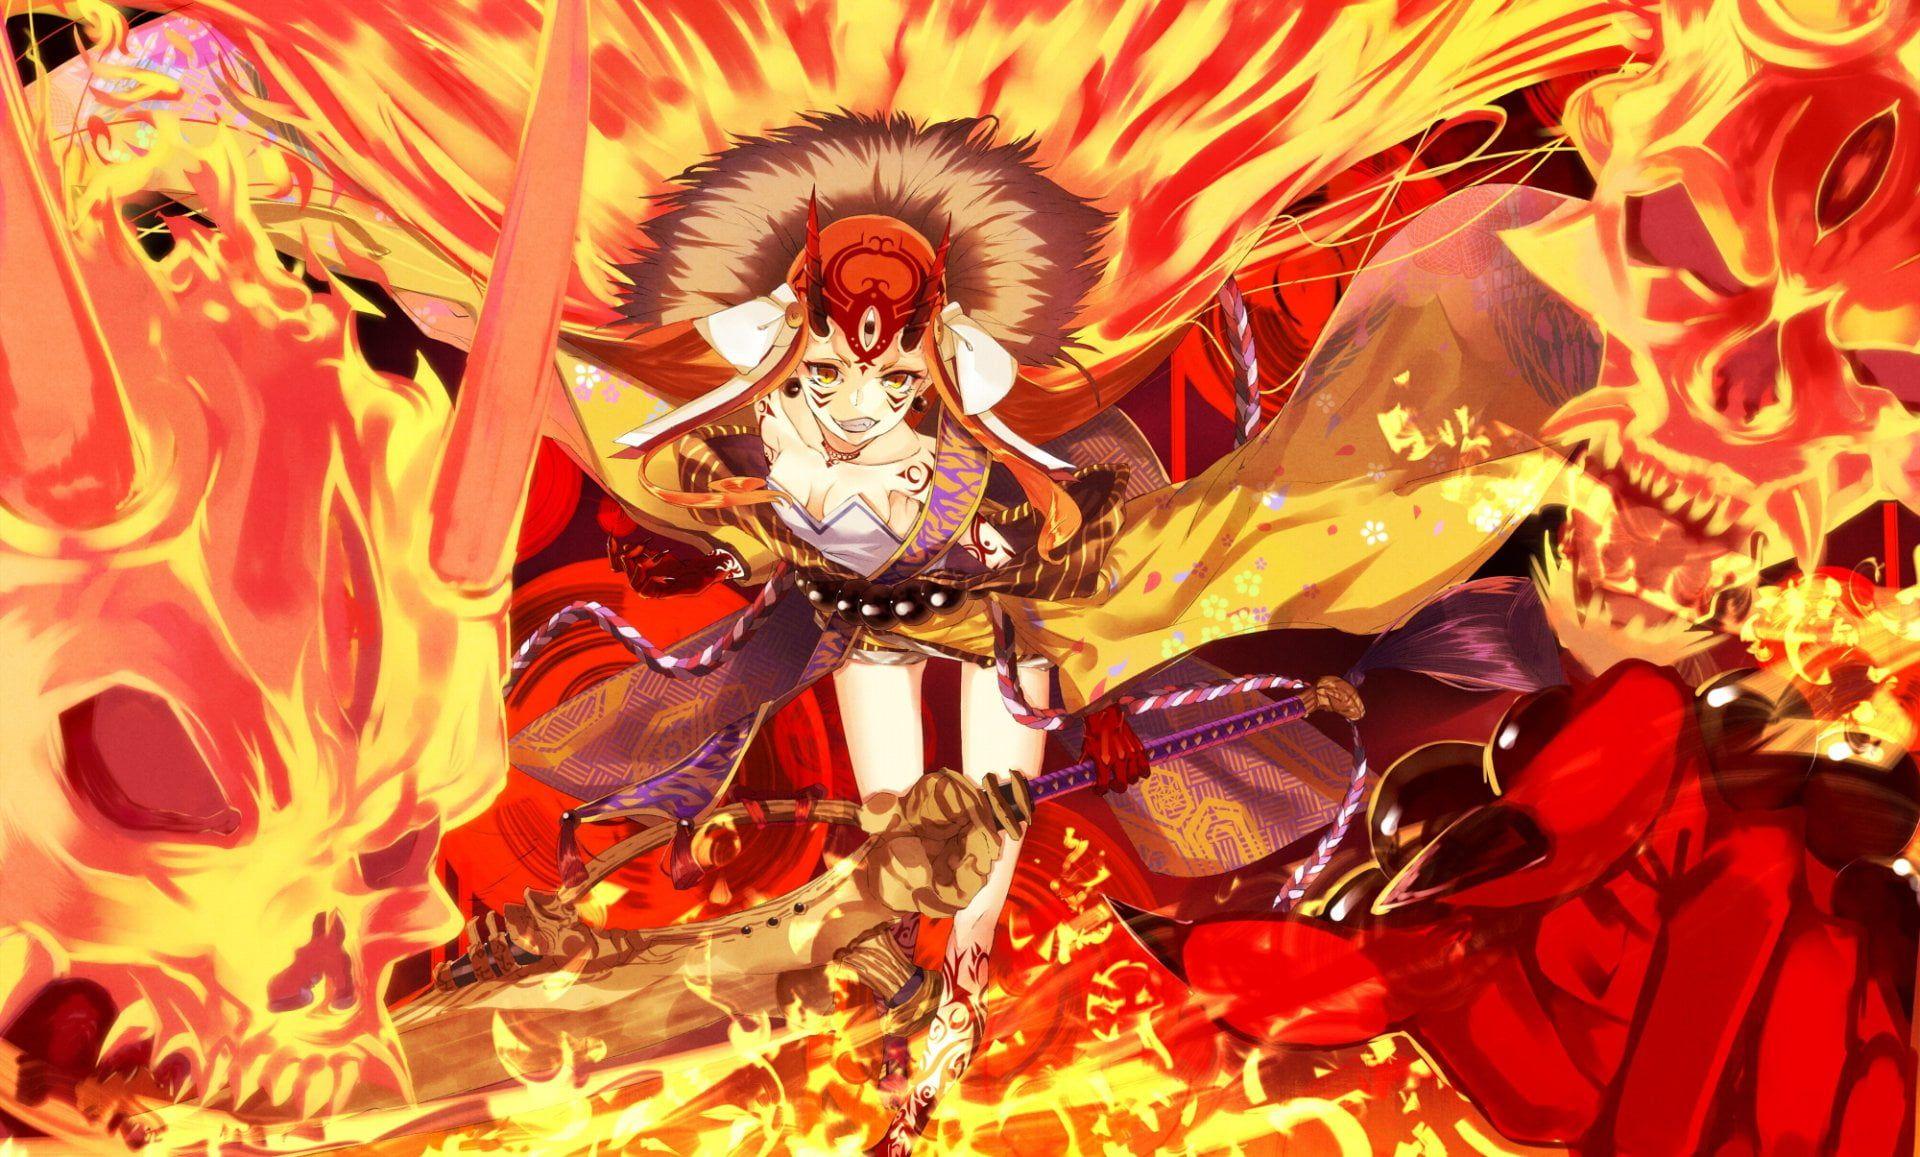 Fate Series Fate Grand Order Ibaraki Douji 1080p Wallpaper Hdwallpaper Desktop Ibaraki Fate Fate Characters Fate grand order wallpaper